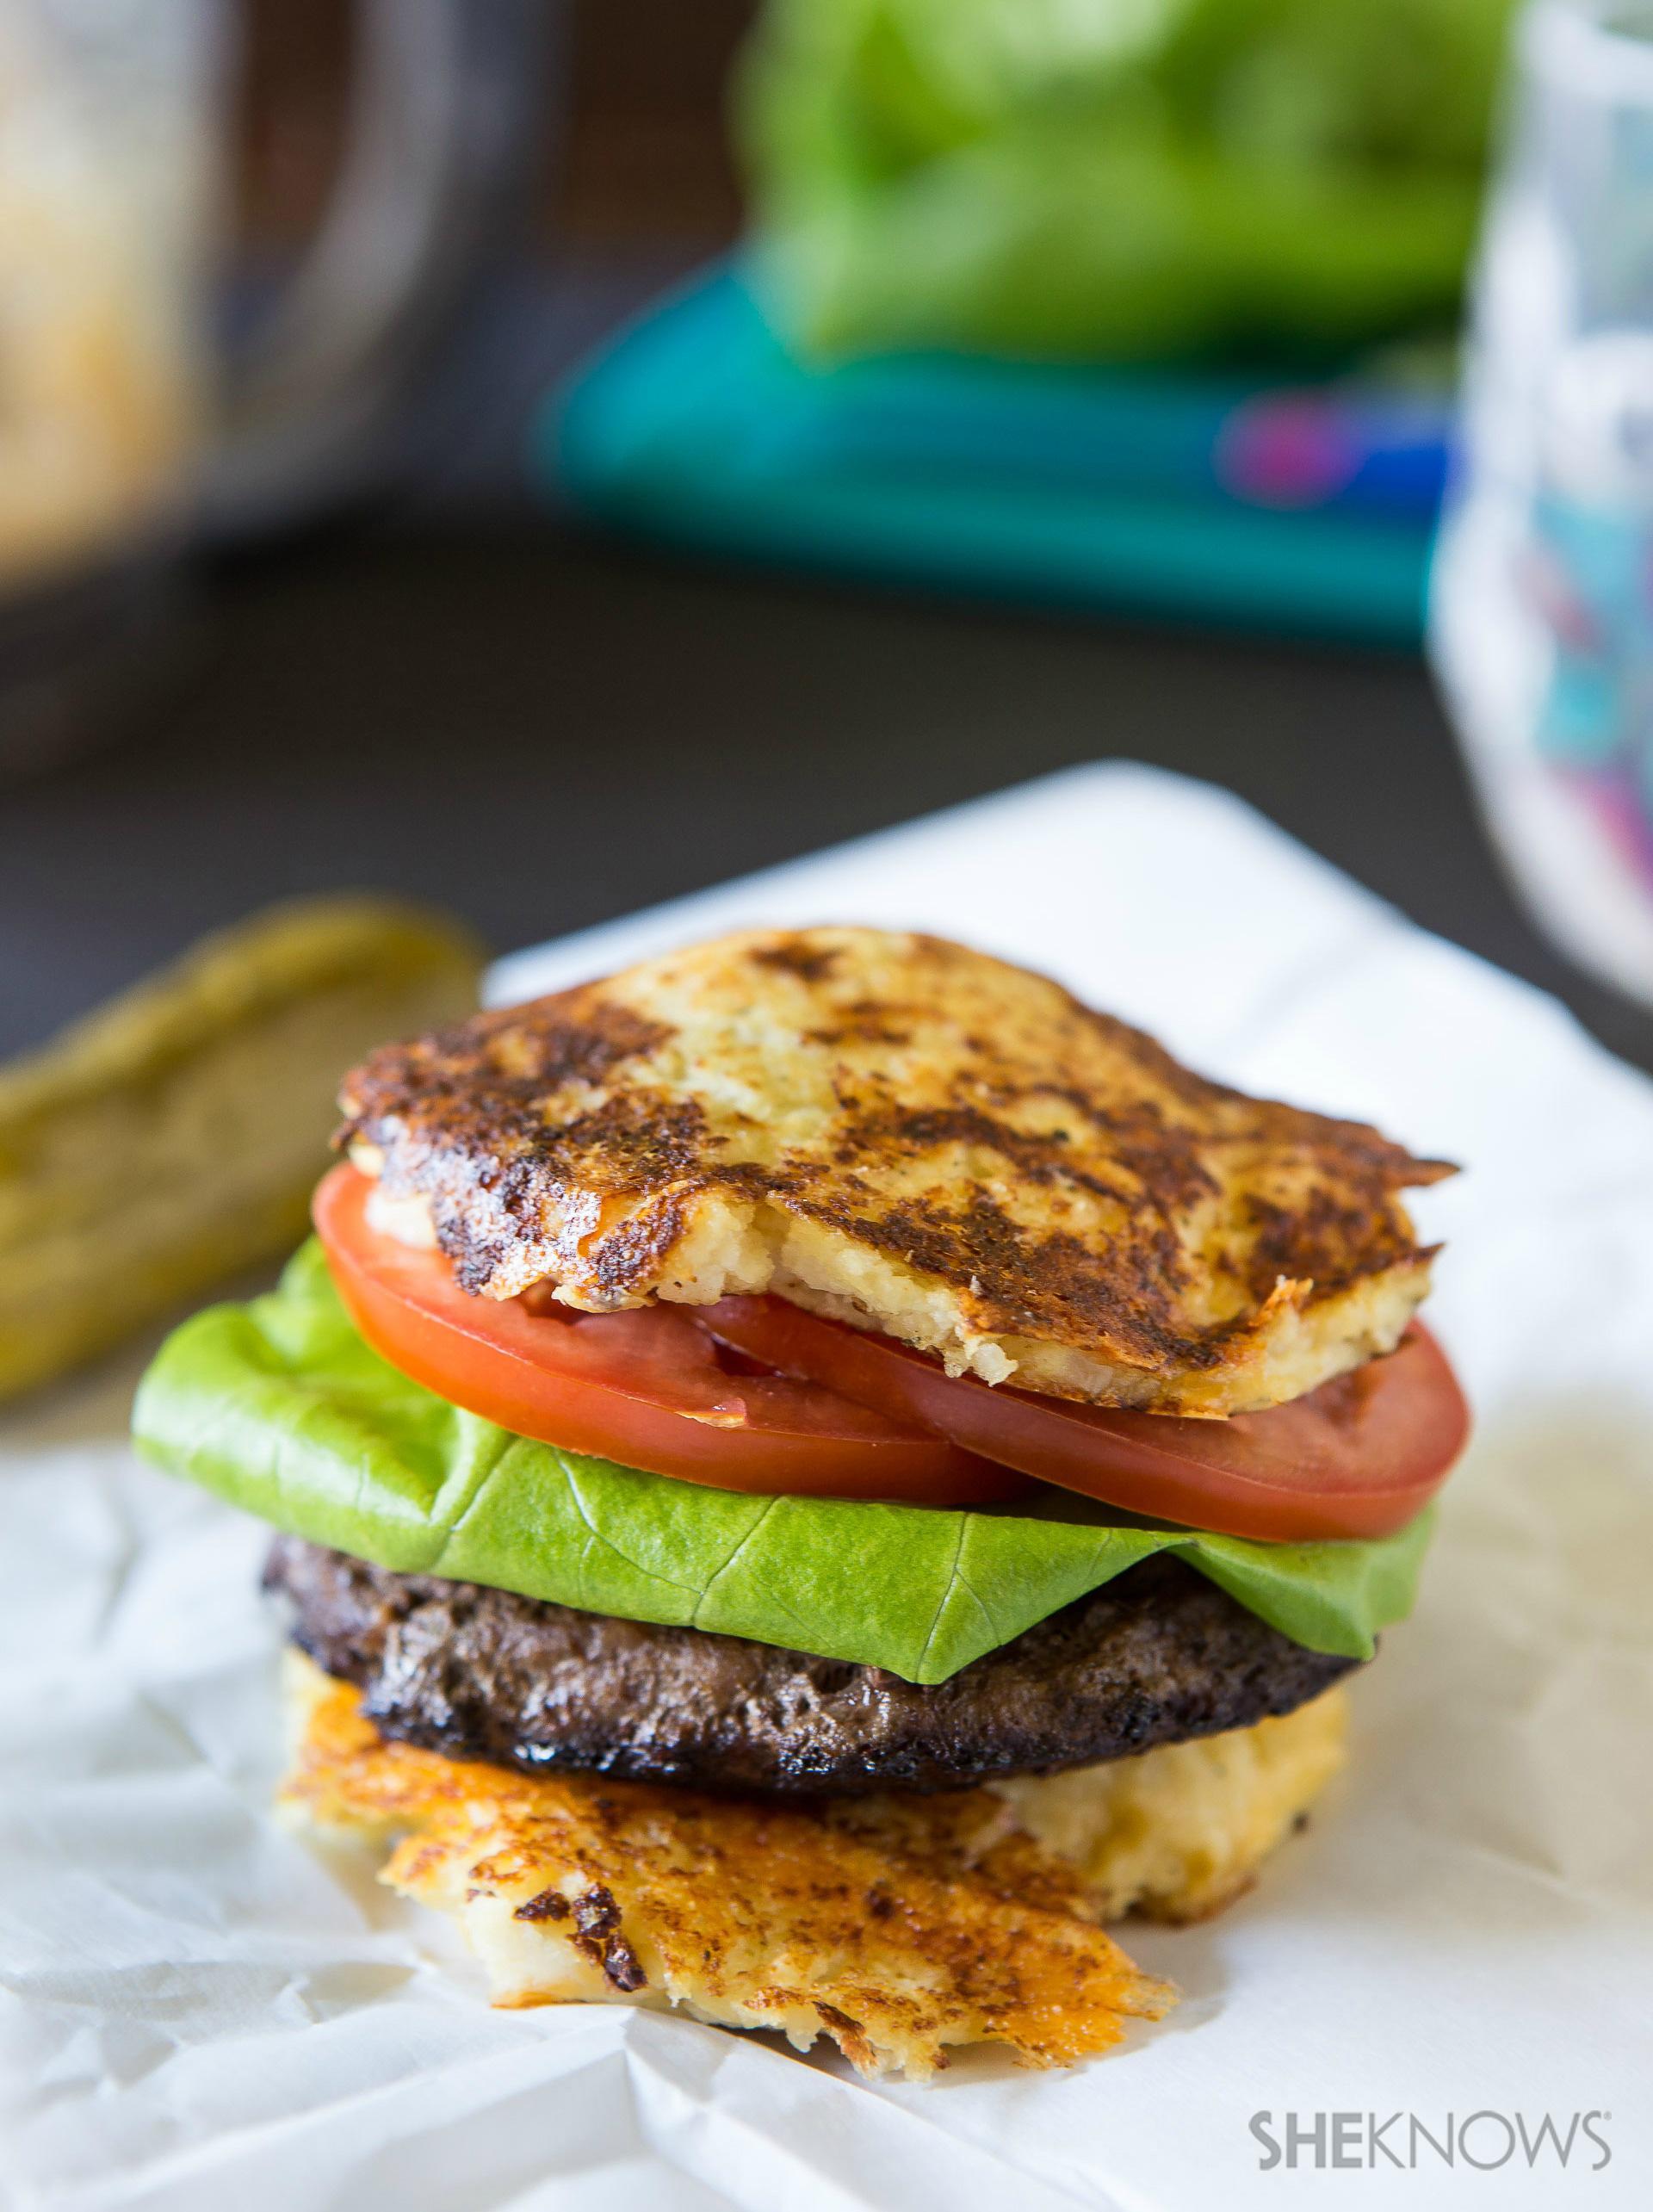 Cauliflower crusted burger